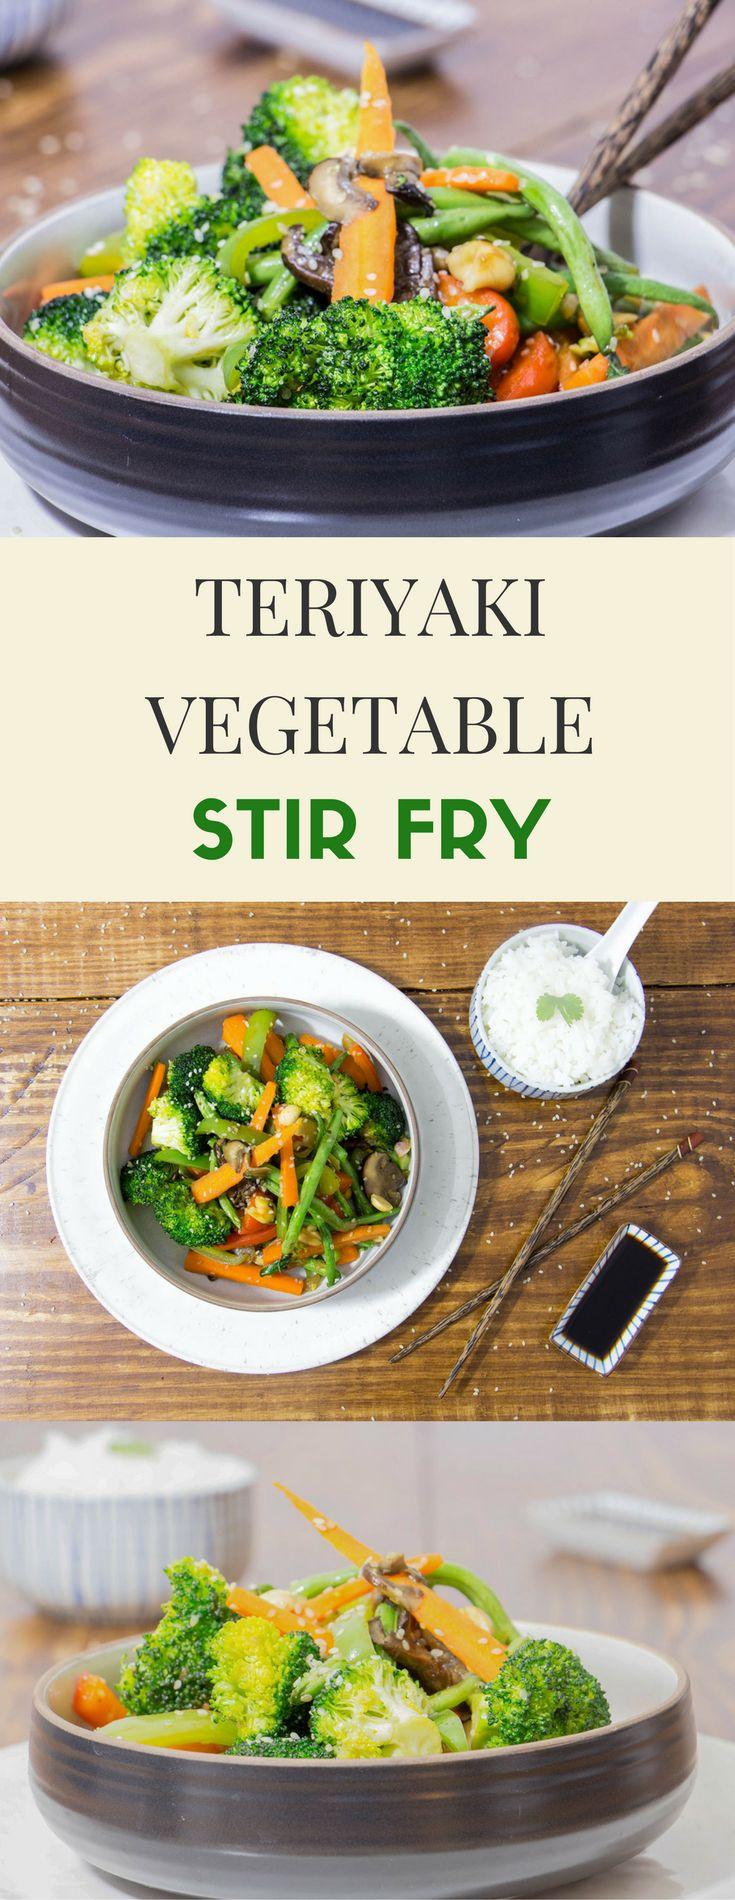 Teriyaki Vegetable Stir-Fry